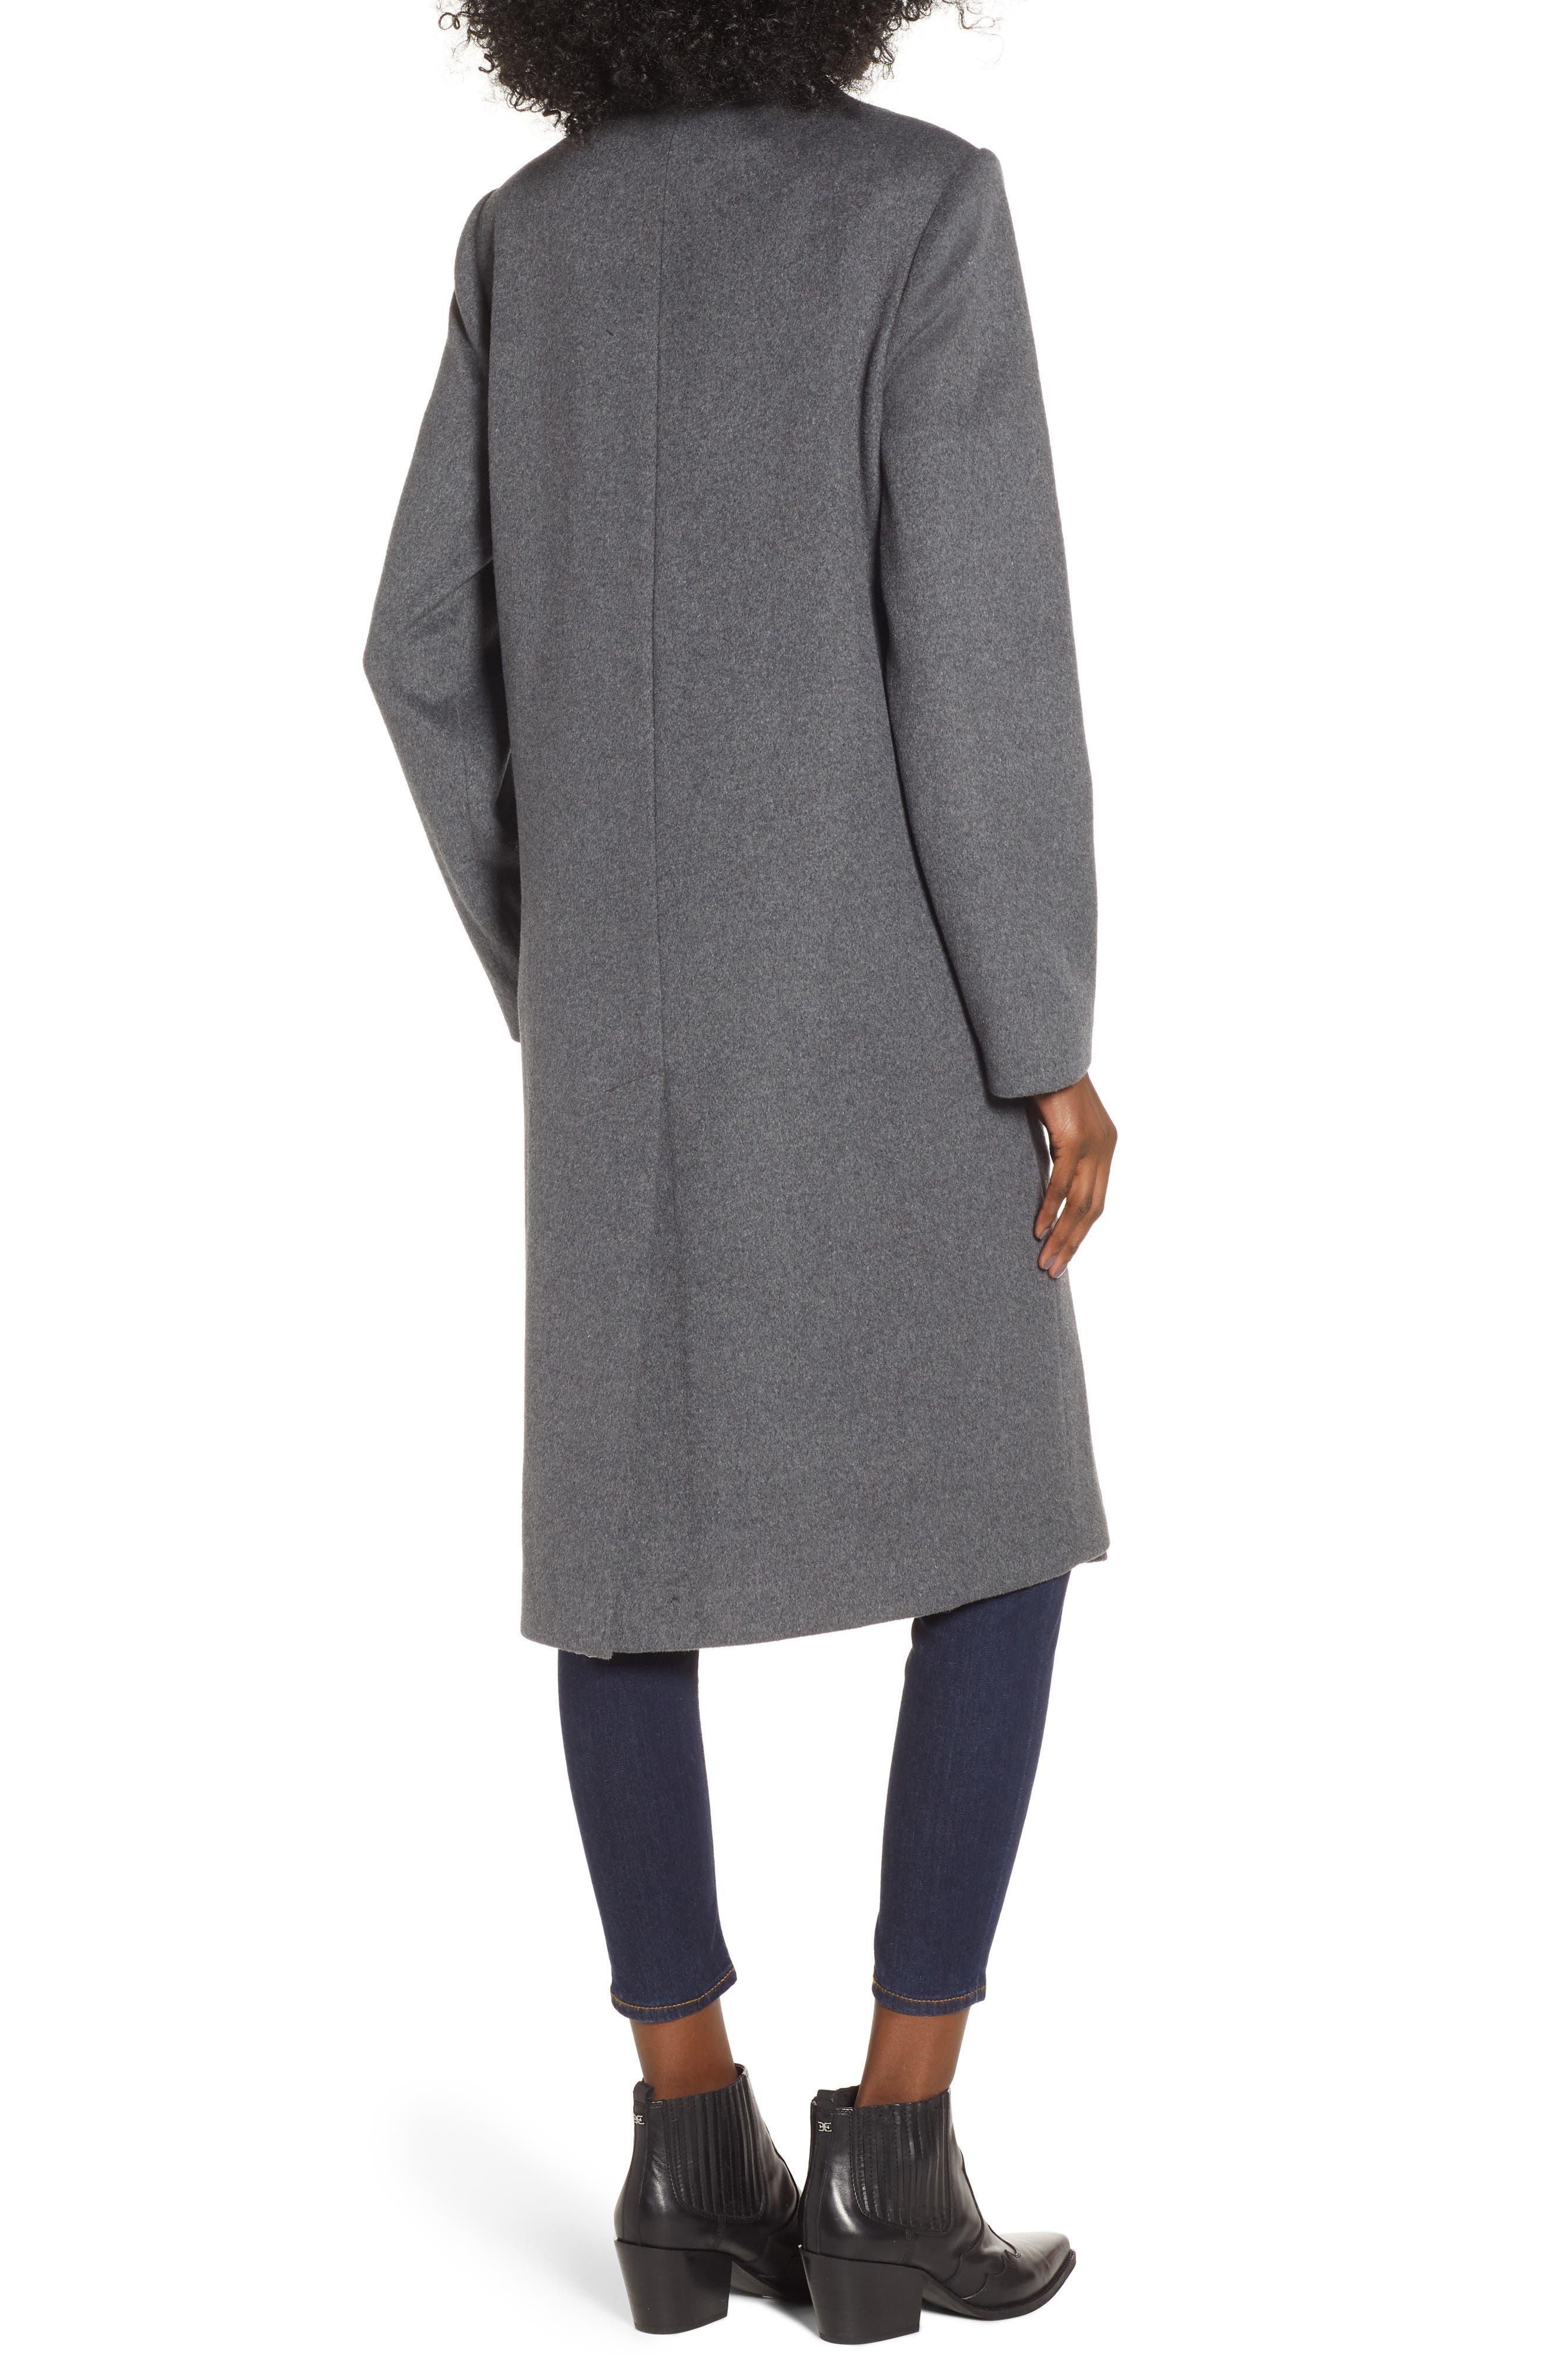 MURAL,                             Long Open Front Coat,                             Alternate thumbnail 2, color,                             CHARCOAL GREY